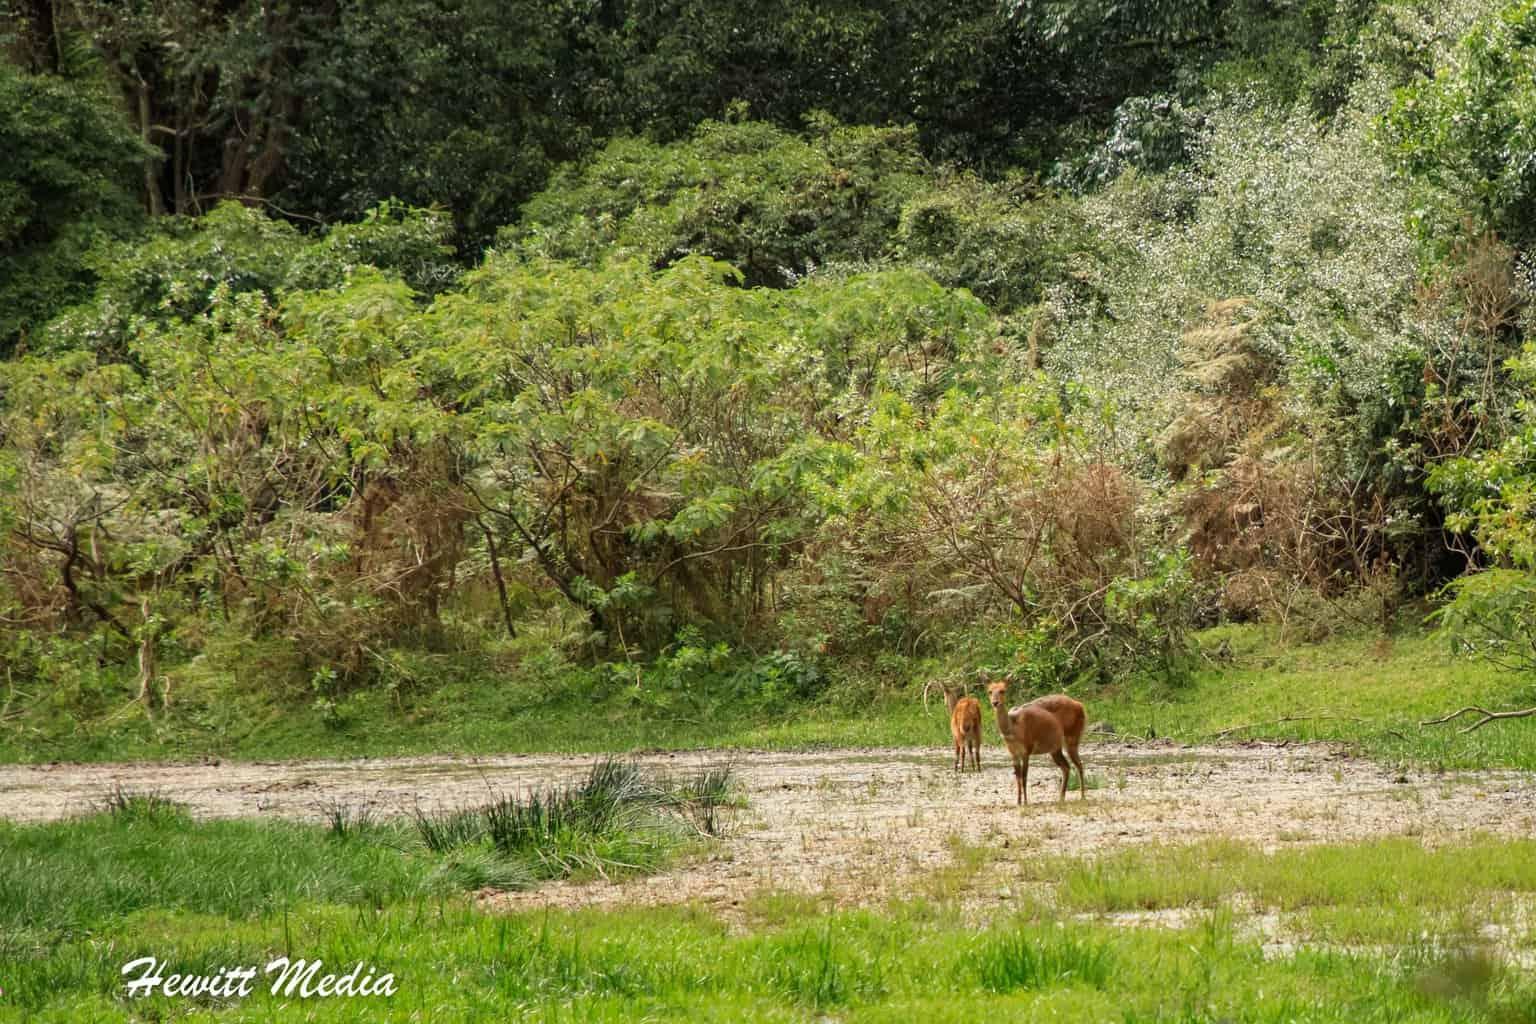 Wildlife inside Arusha National Park